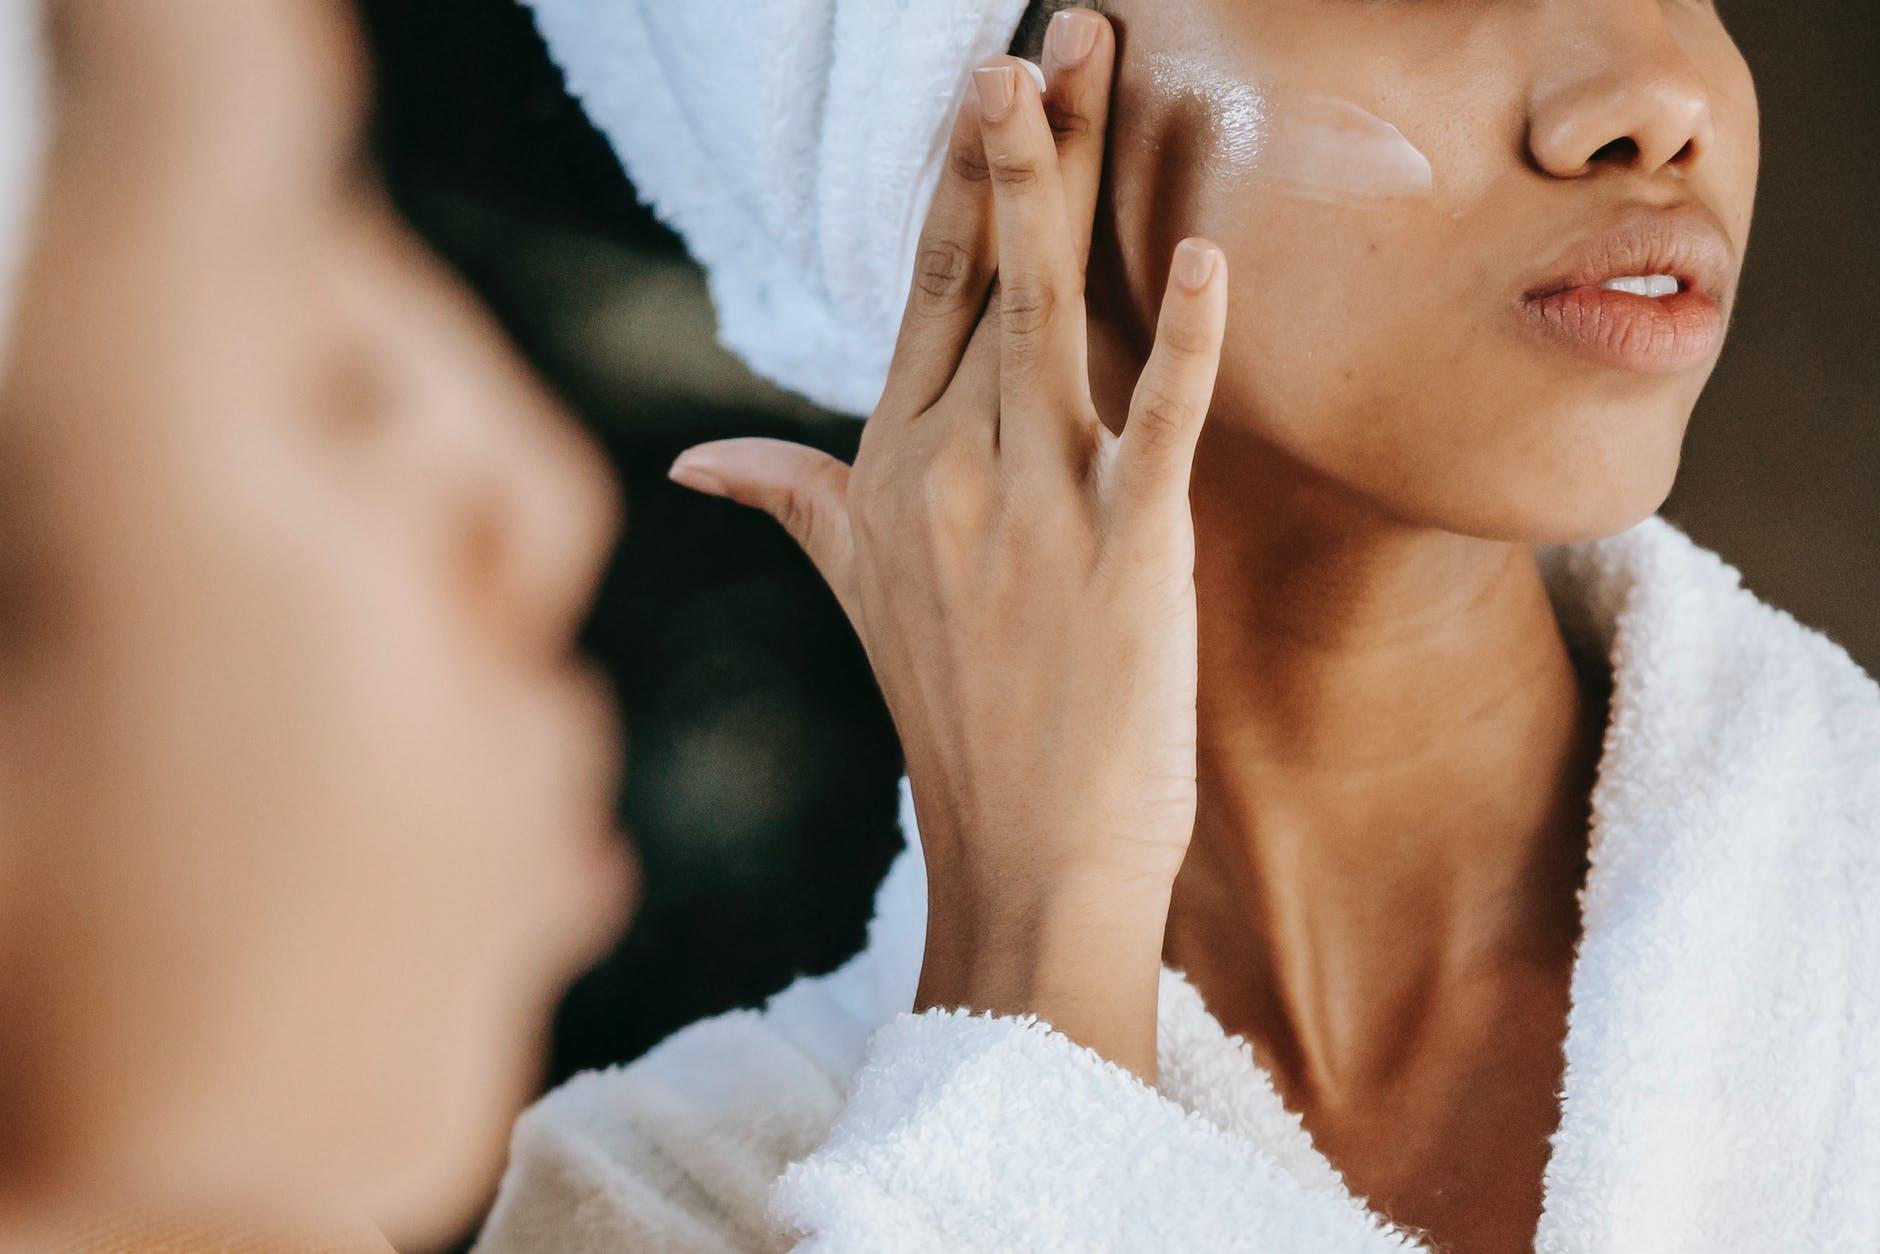 crop ethnic woman applying cream on face against mirror